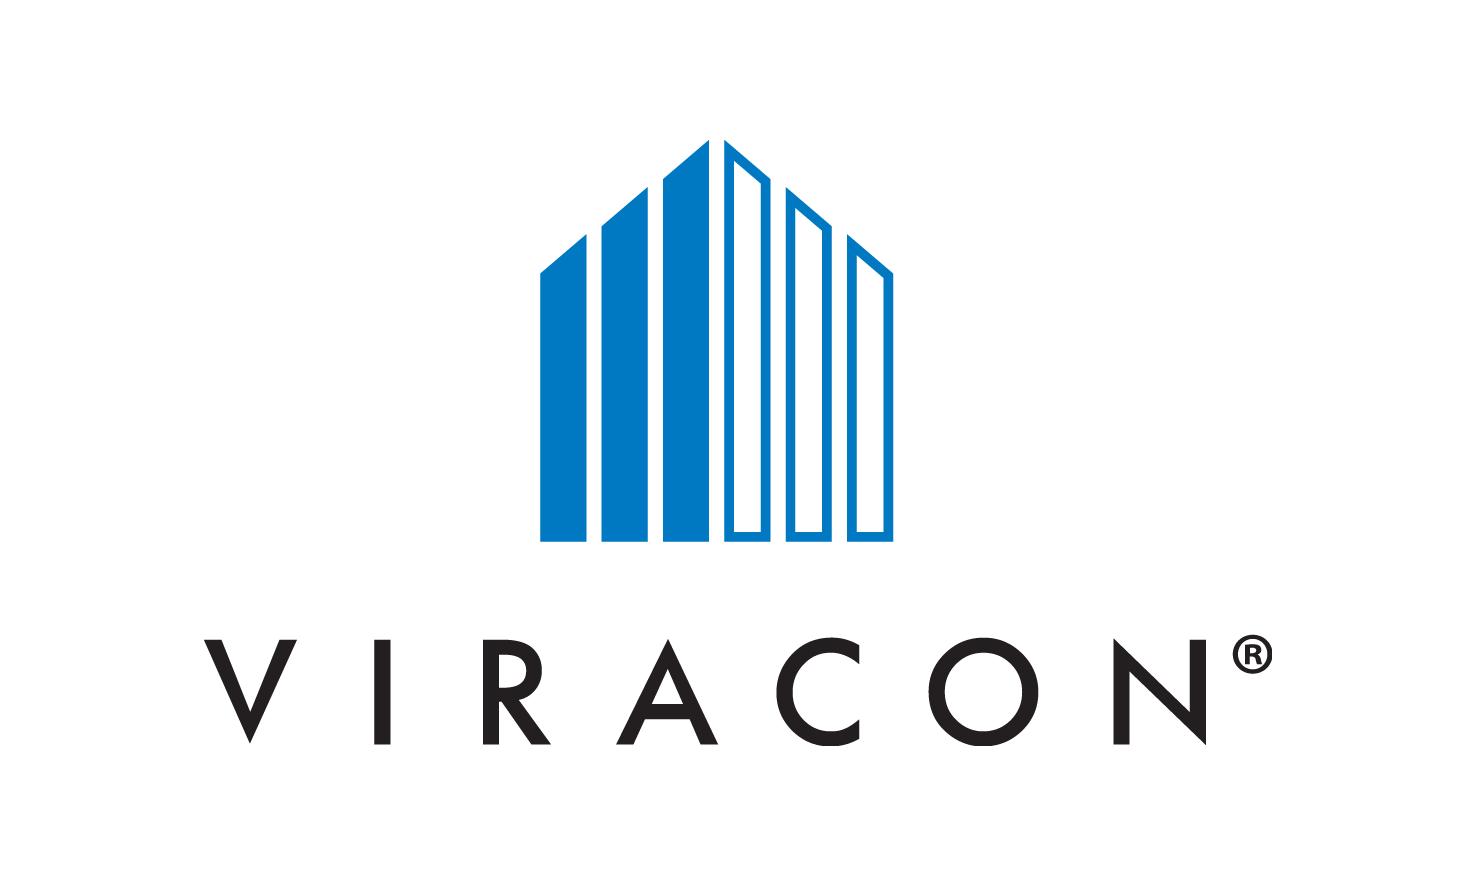 ViraconLogoRGB.png